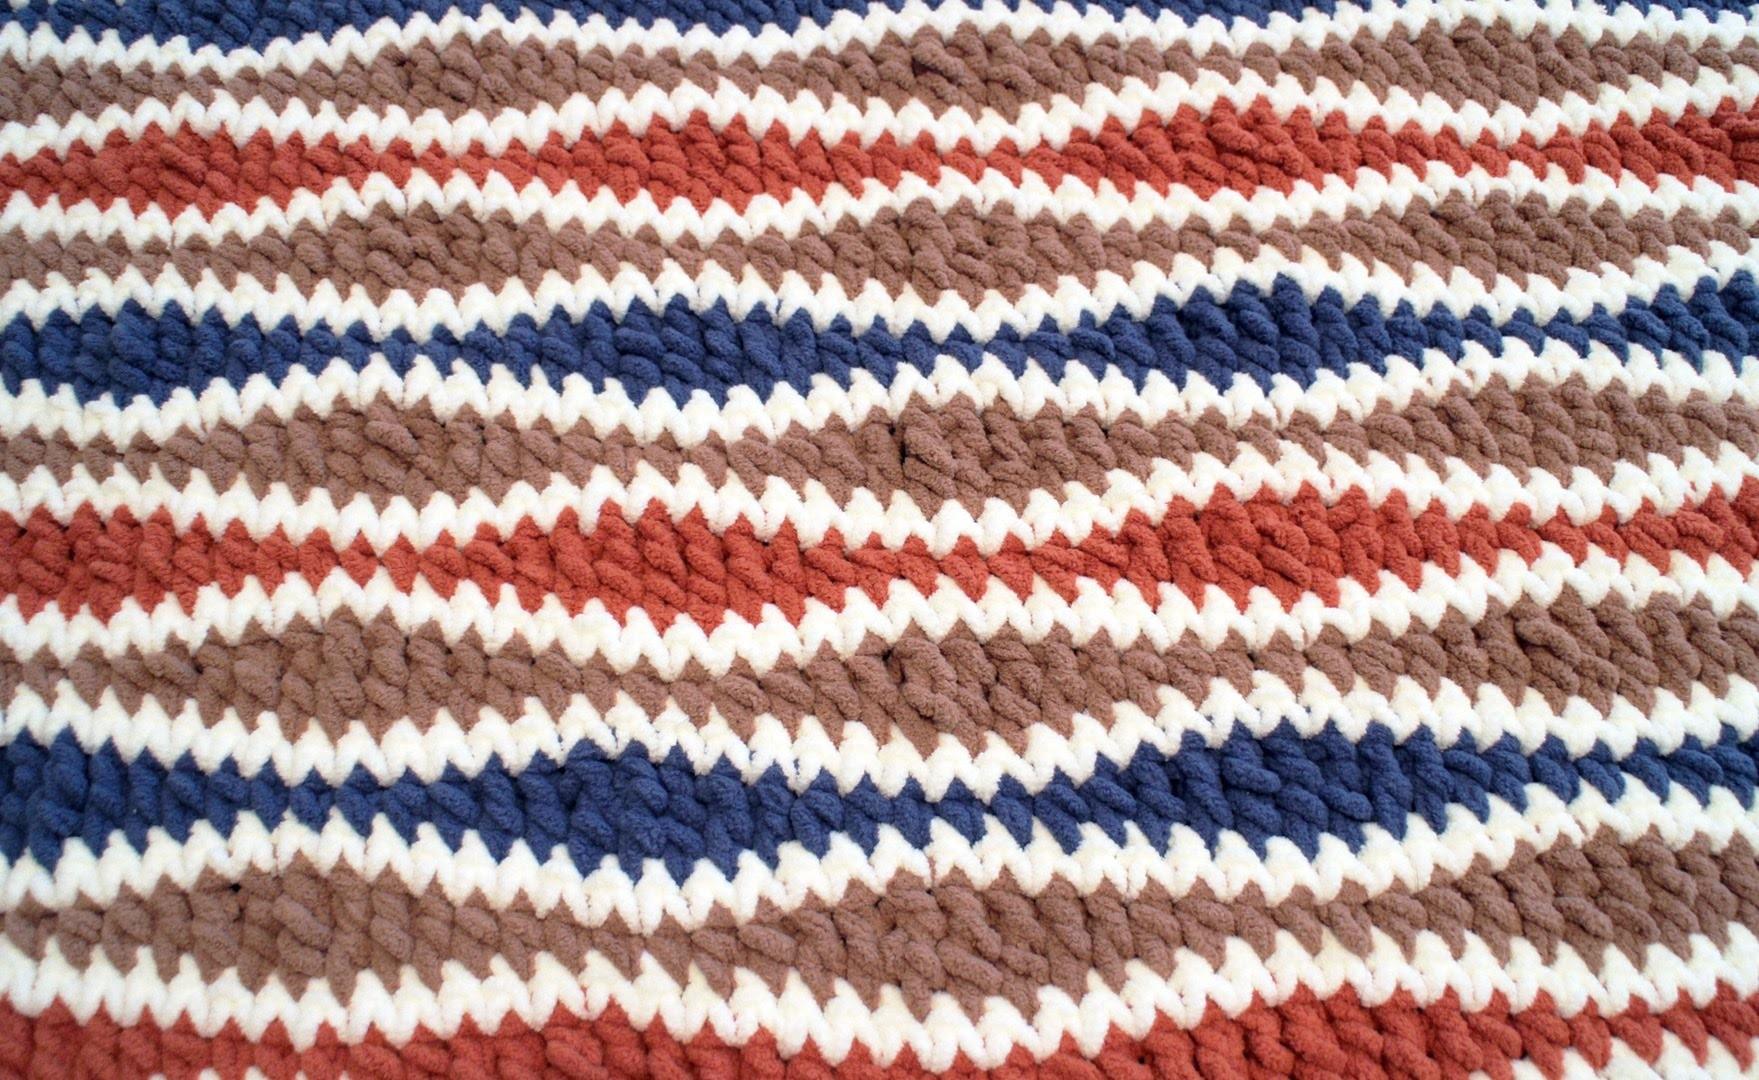 Left Hand: The Crochet Wavelength Stitch